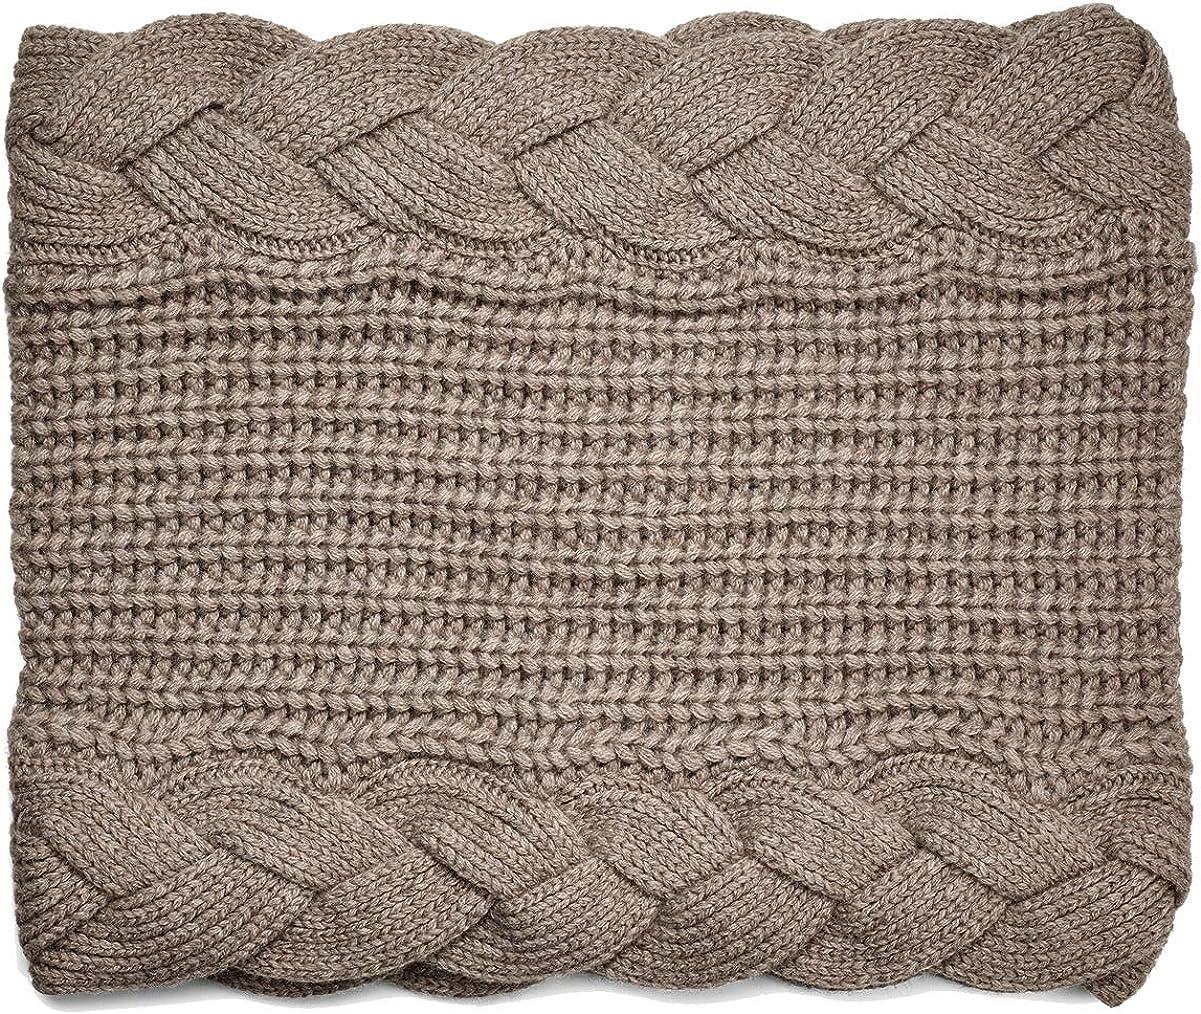 UGG Braided Knit Snood